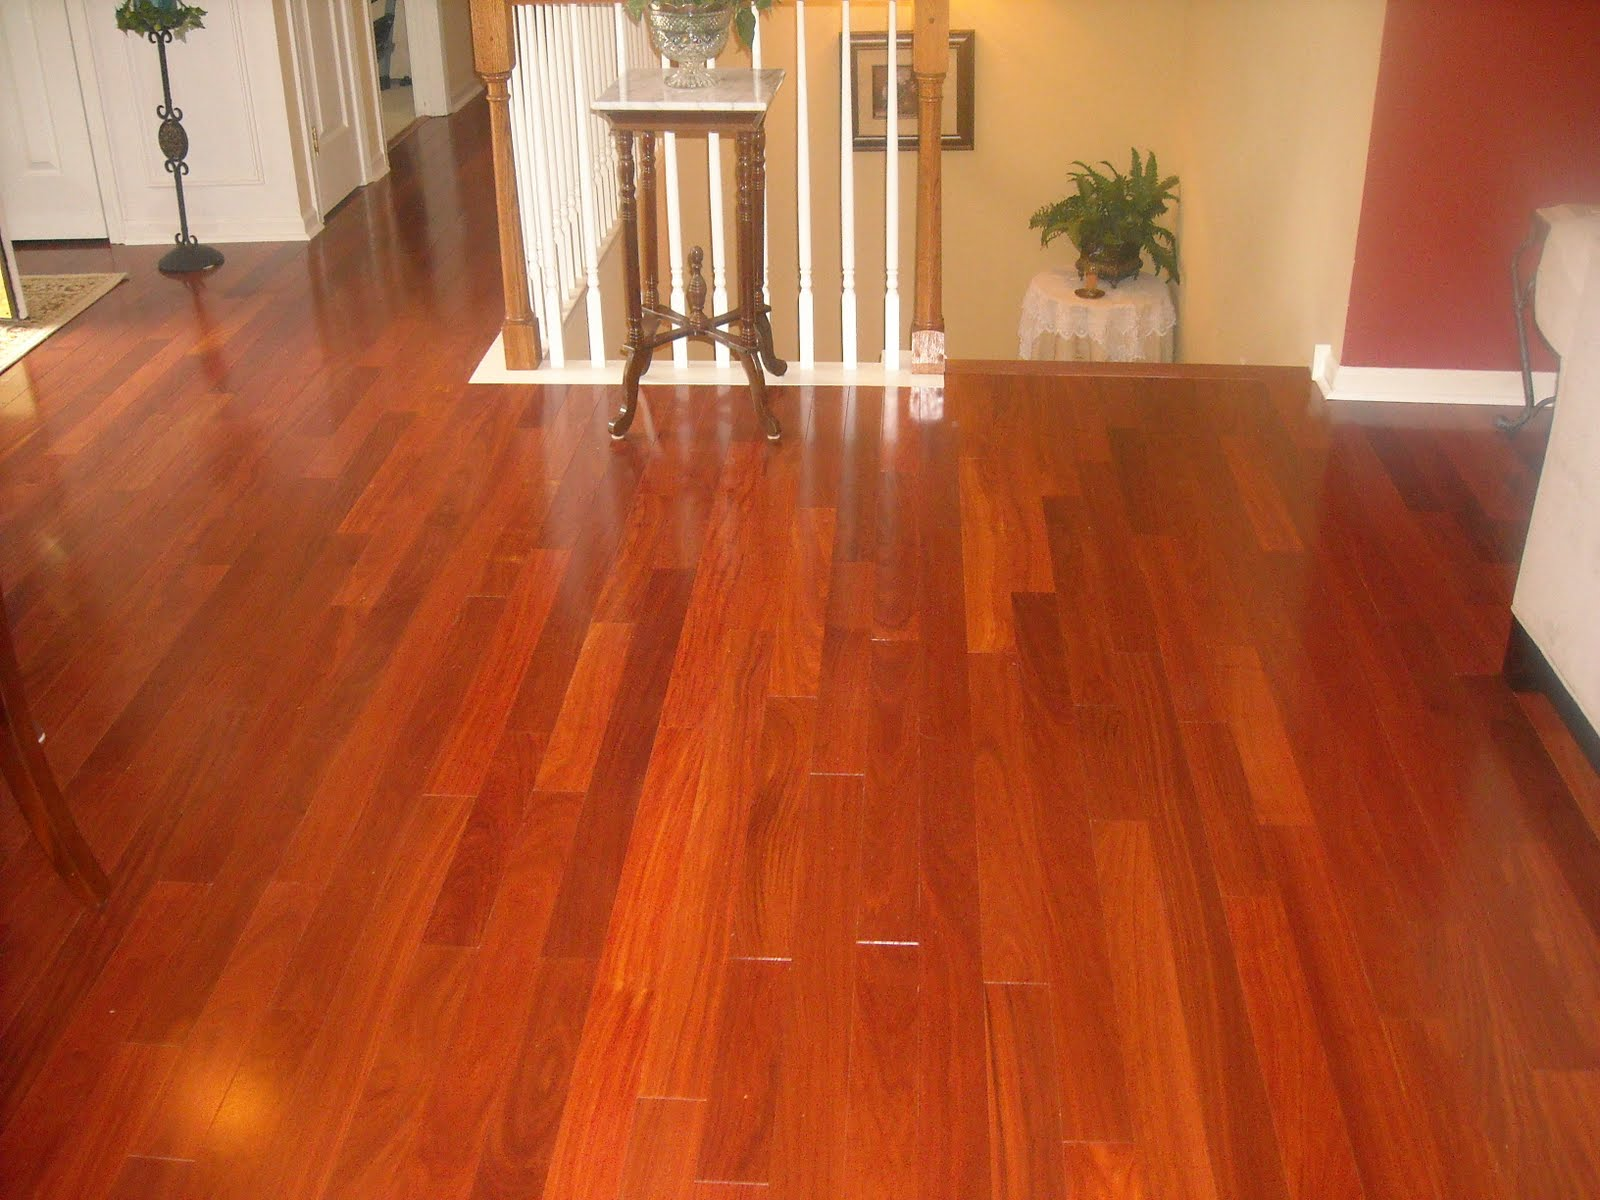 Santos Mahogany Hardwood Flooring - Flooring Ideas Home